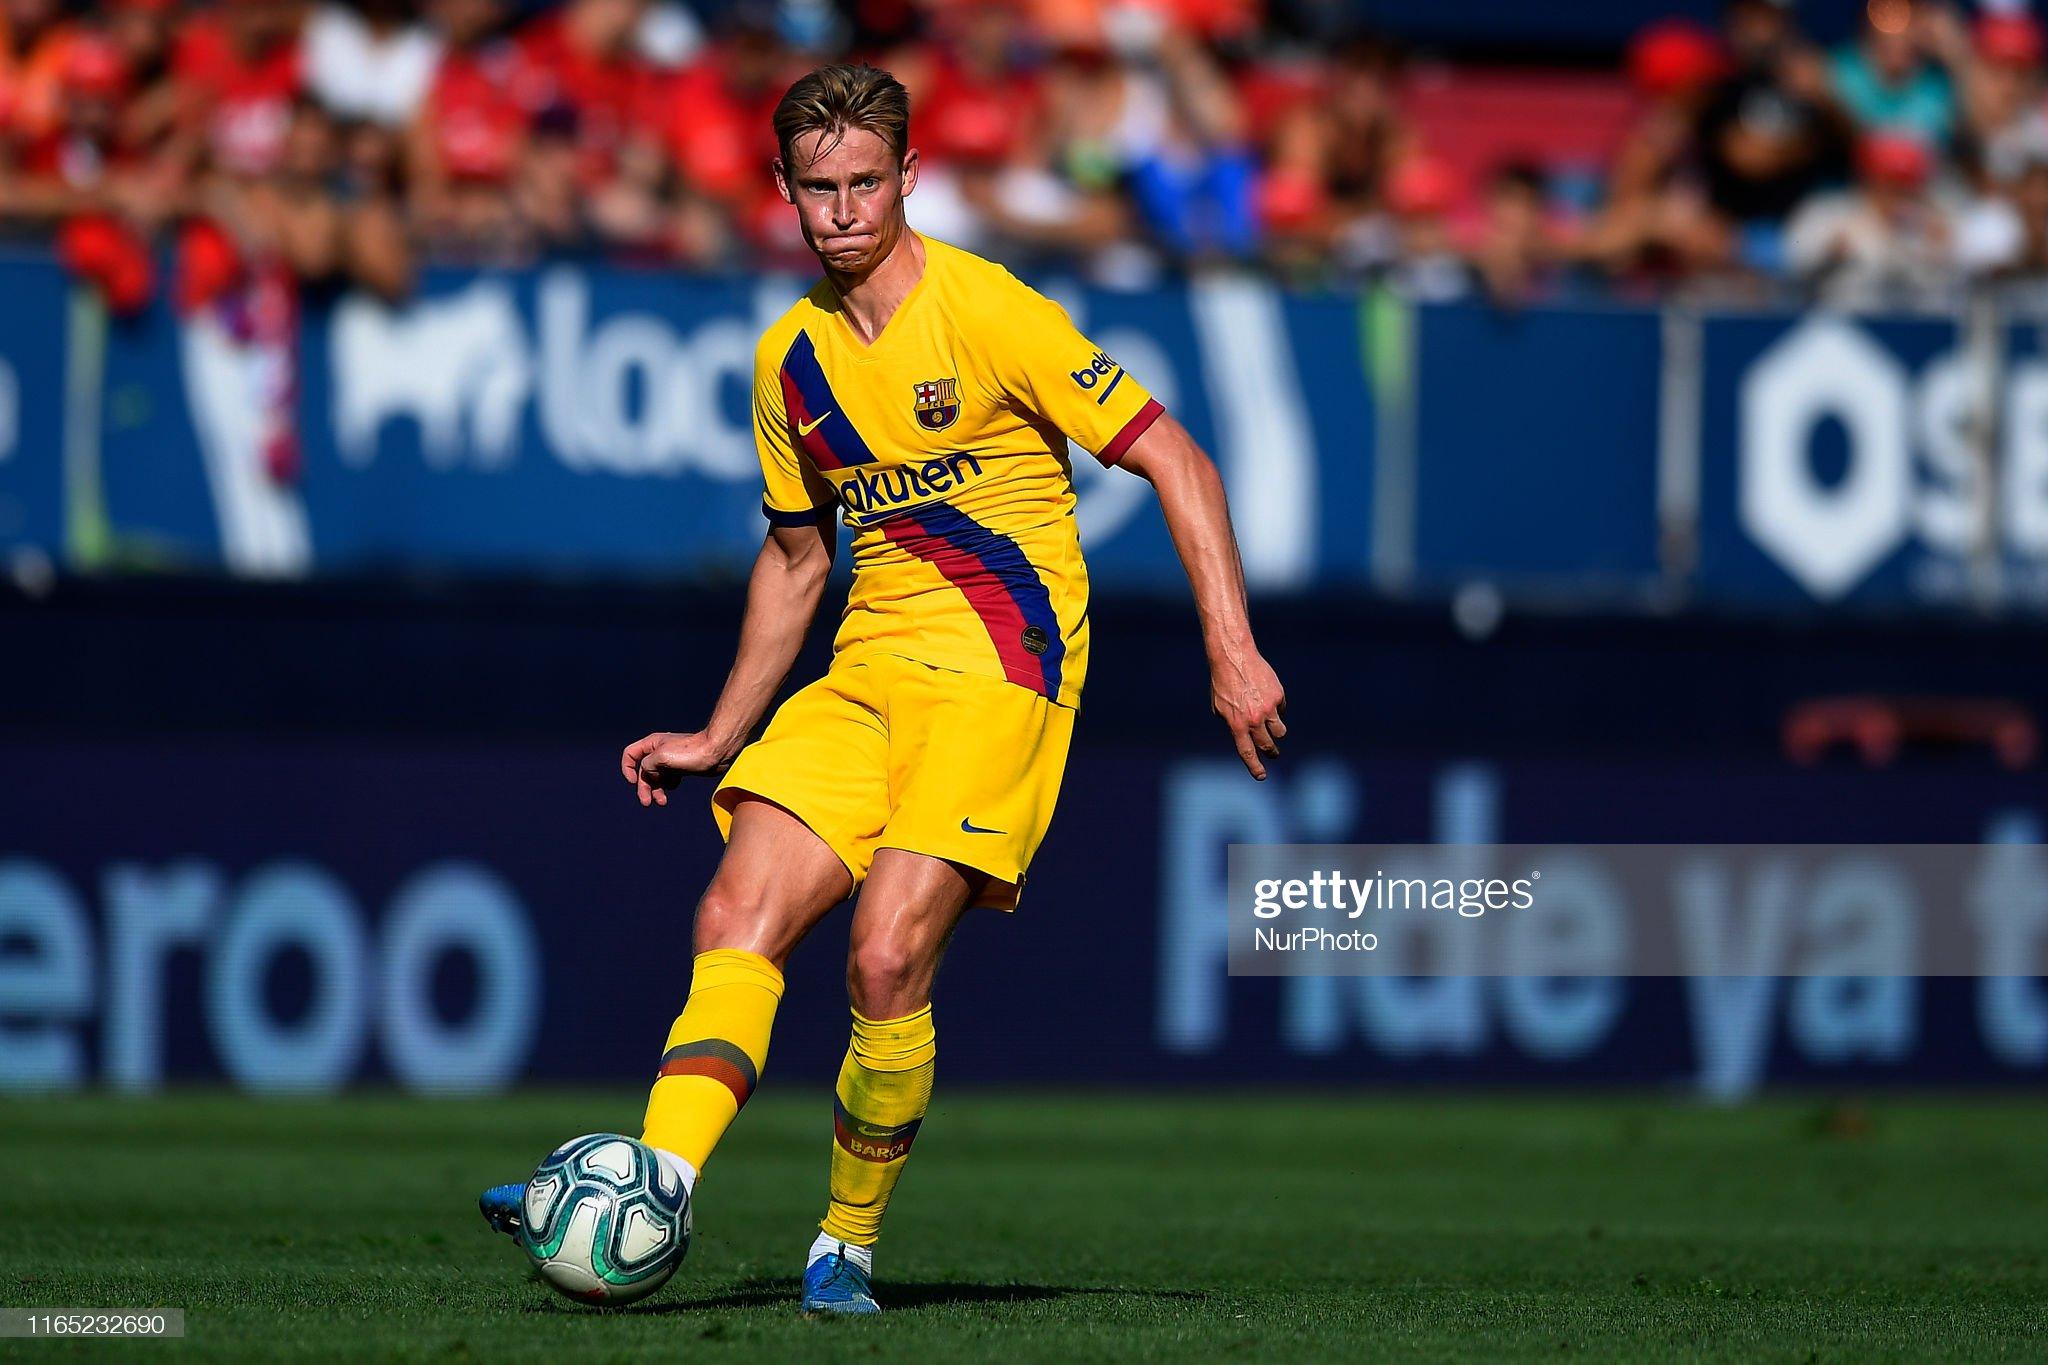 صور مباراة : أوساسونا - برشلونة 2-2 ( 31-08-2019 )  Frenkie-de-jong-of-barcelona-in-action-during-the-liga-match-between-picture-id1165232690?s=2048x2048